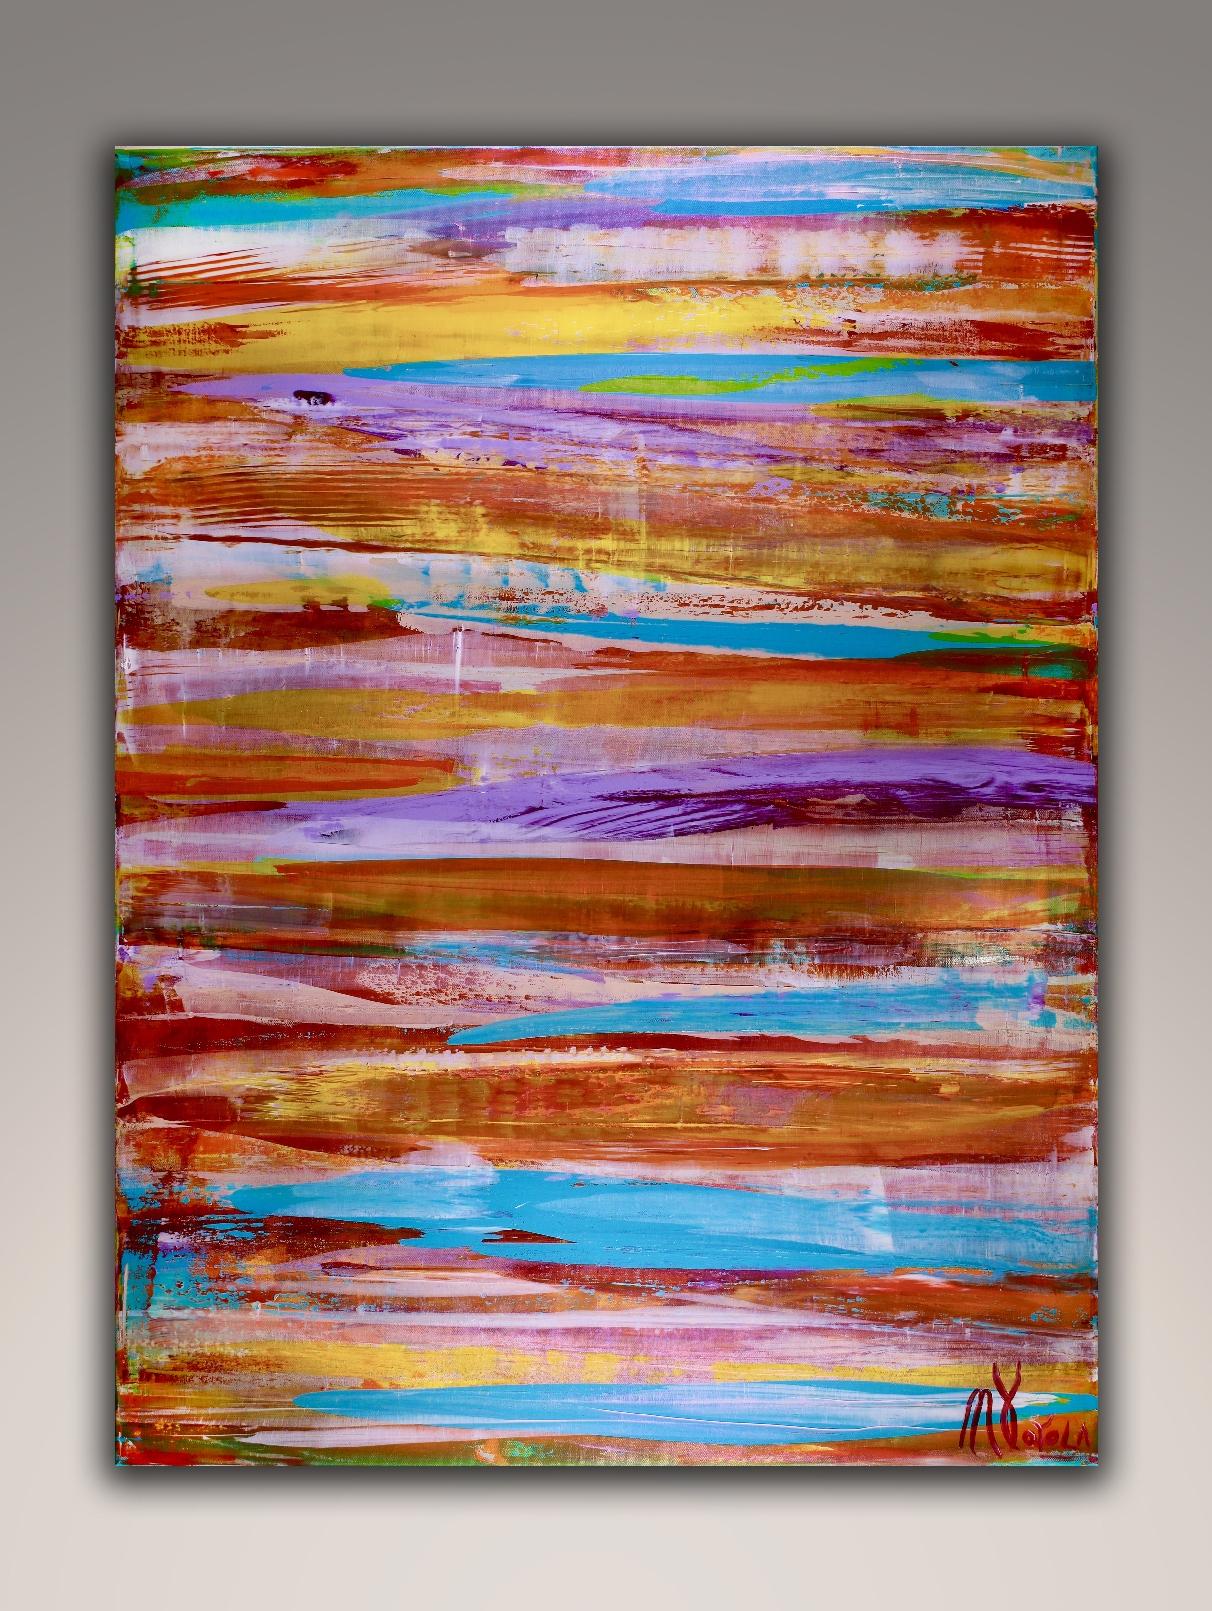 Energy Fusion 9 by Nestor Toro (2018) abstract art - Acrylic painting by Nestor Toro